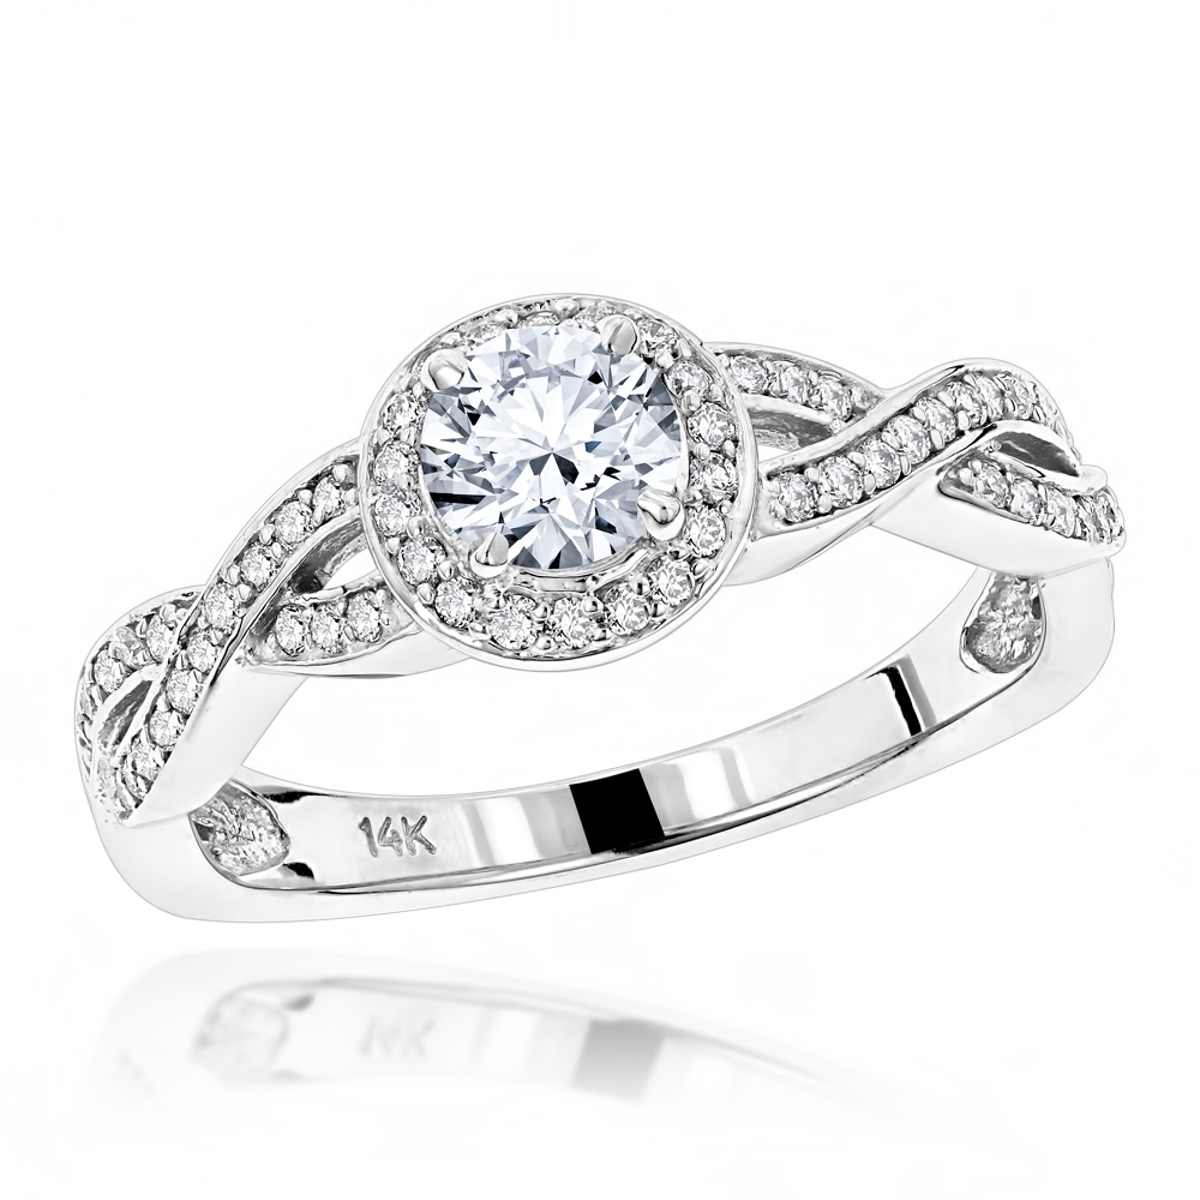 Halo 14K Gold Diamond Engagement Ring Mounting 0.38ct